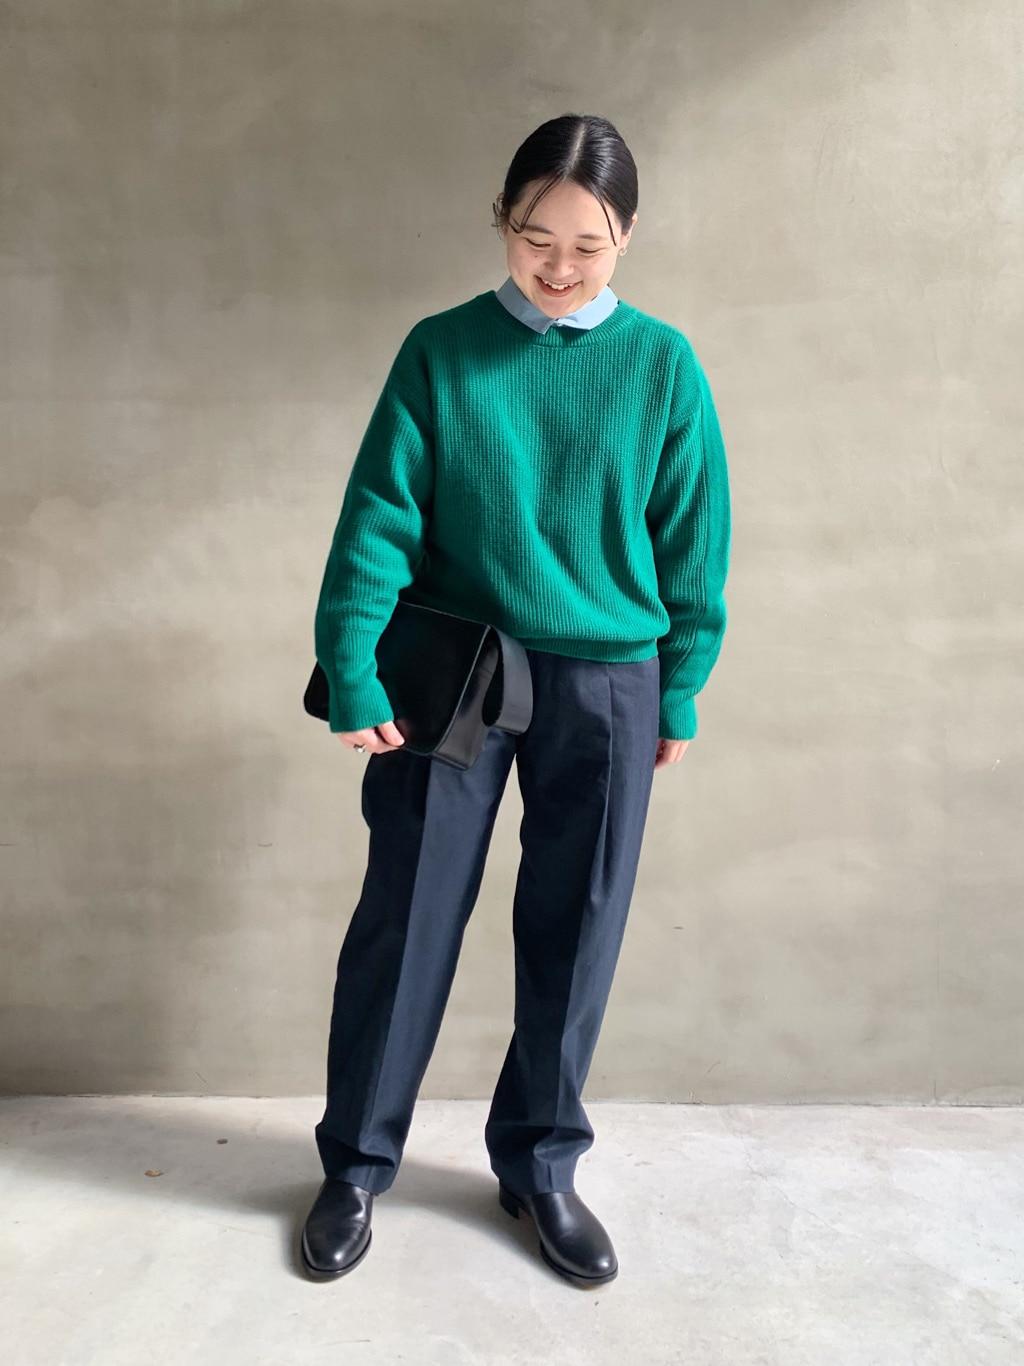 caph troupe 福岡薬院路面 身長:148cm 2020.11.19